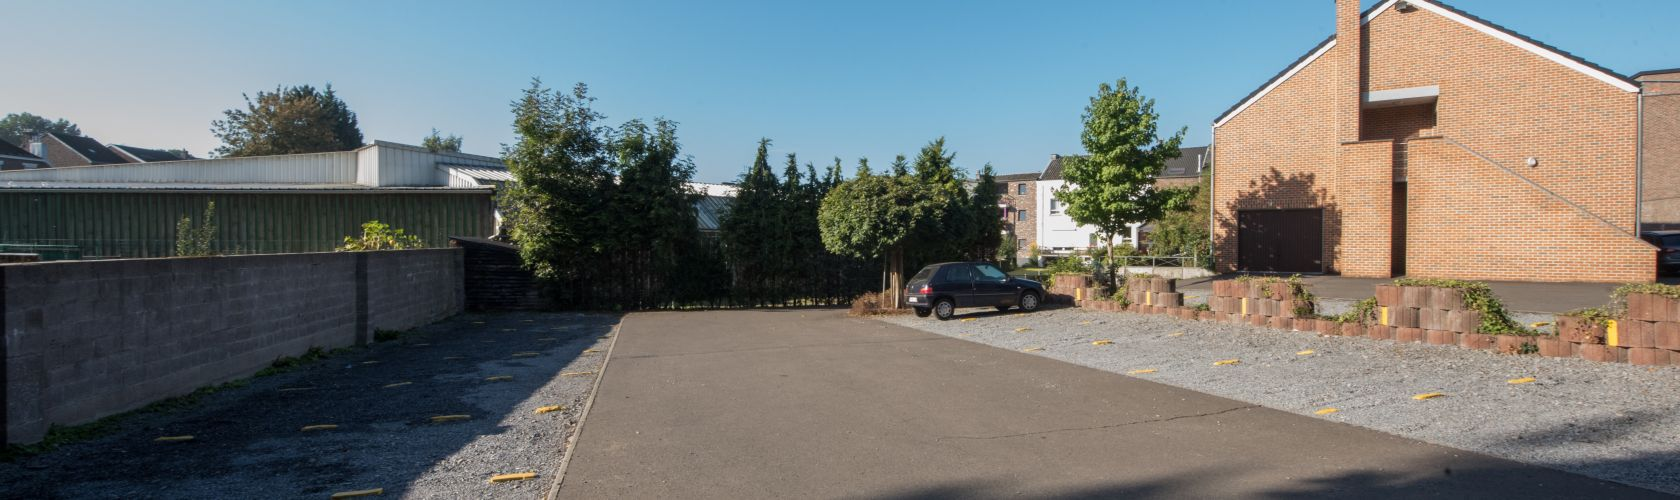 Parking funérarium FunéRADER à Aubel